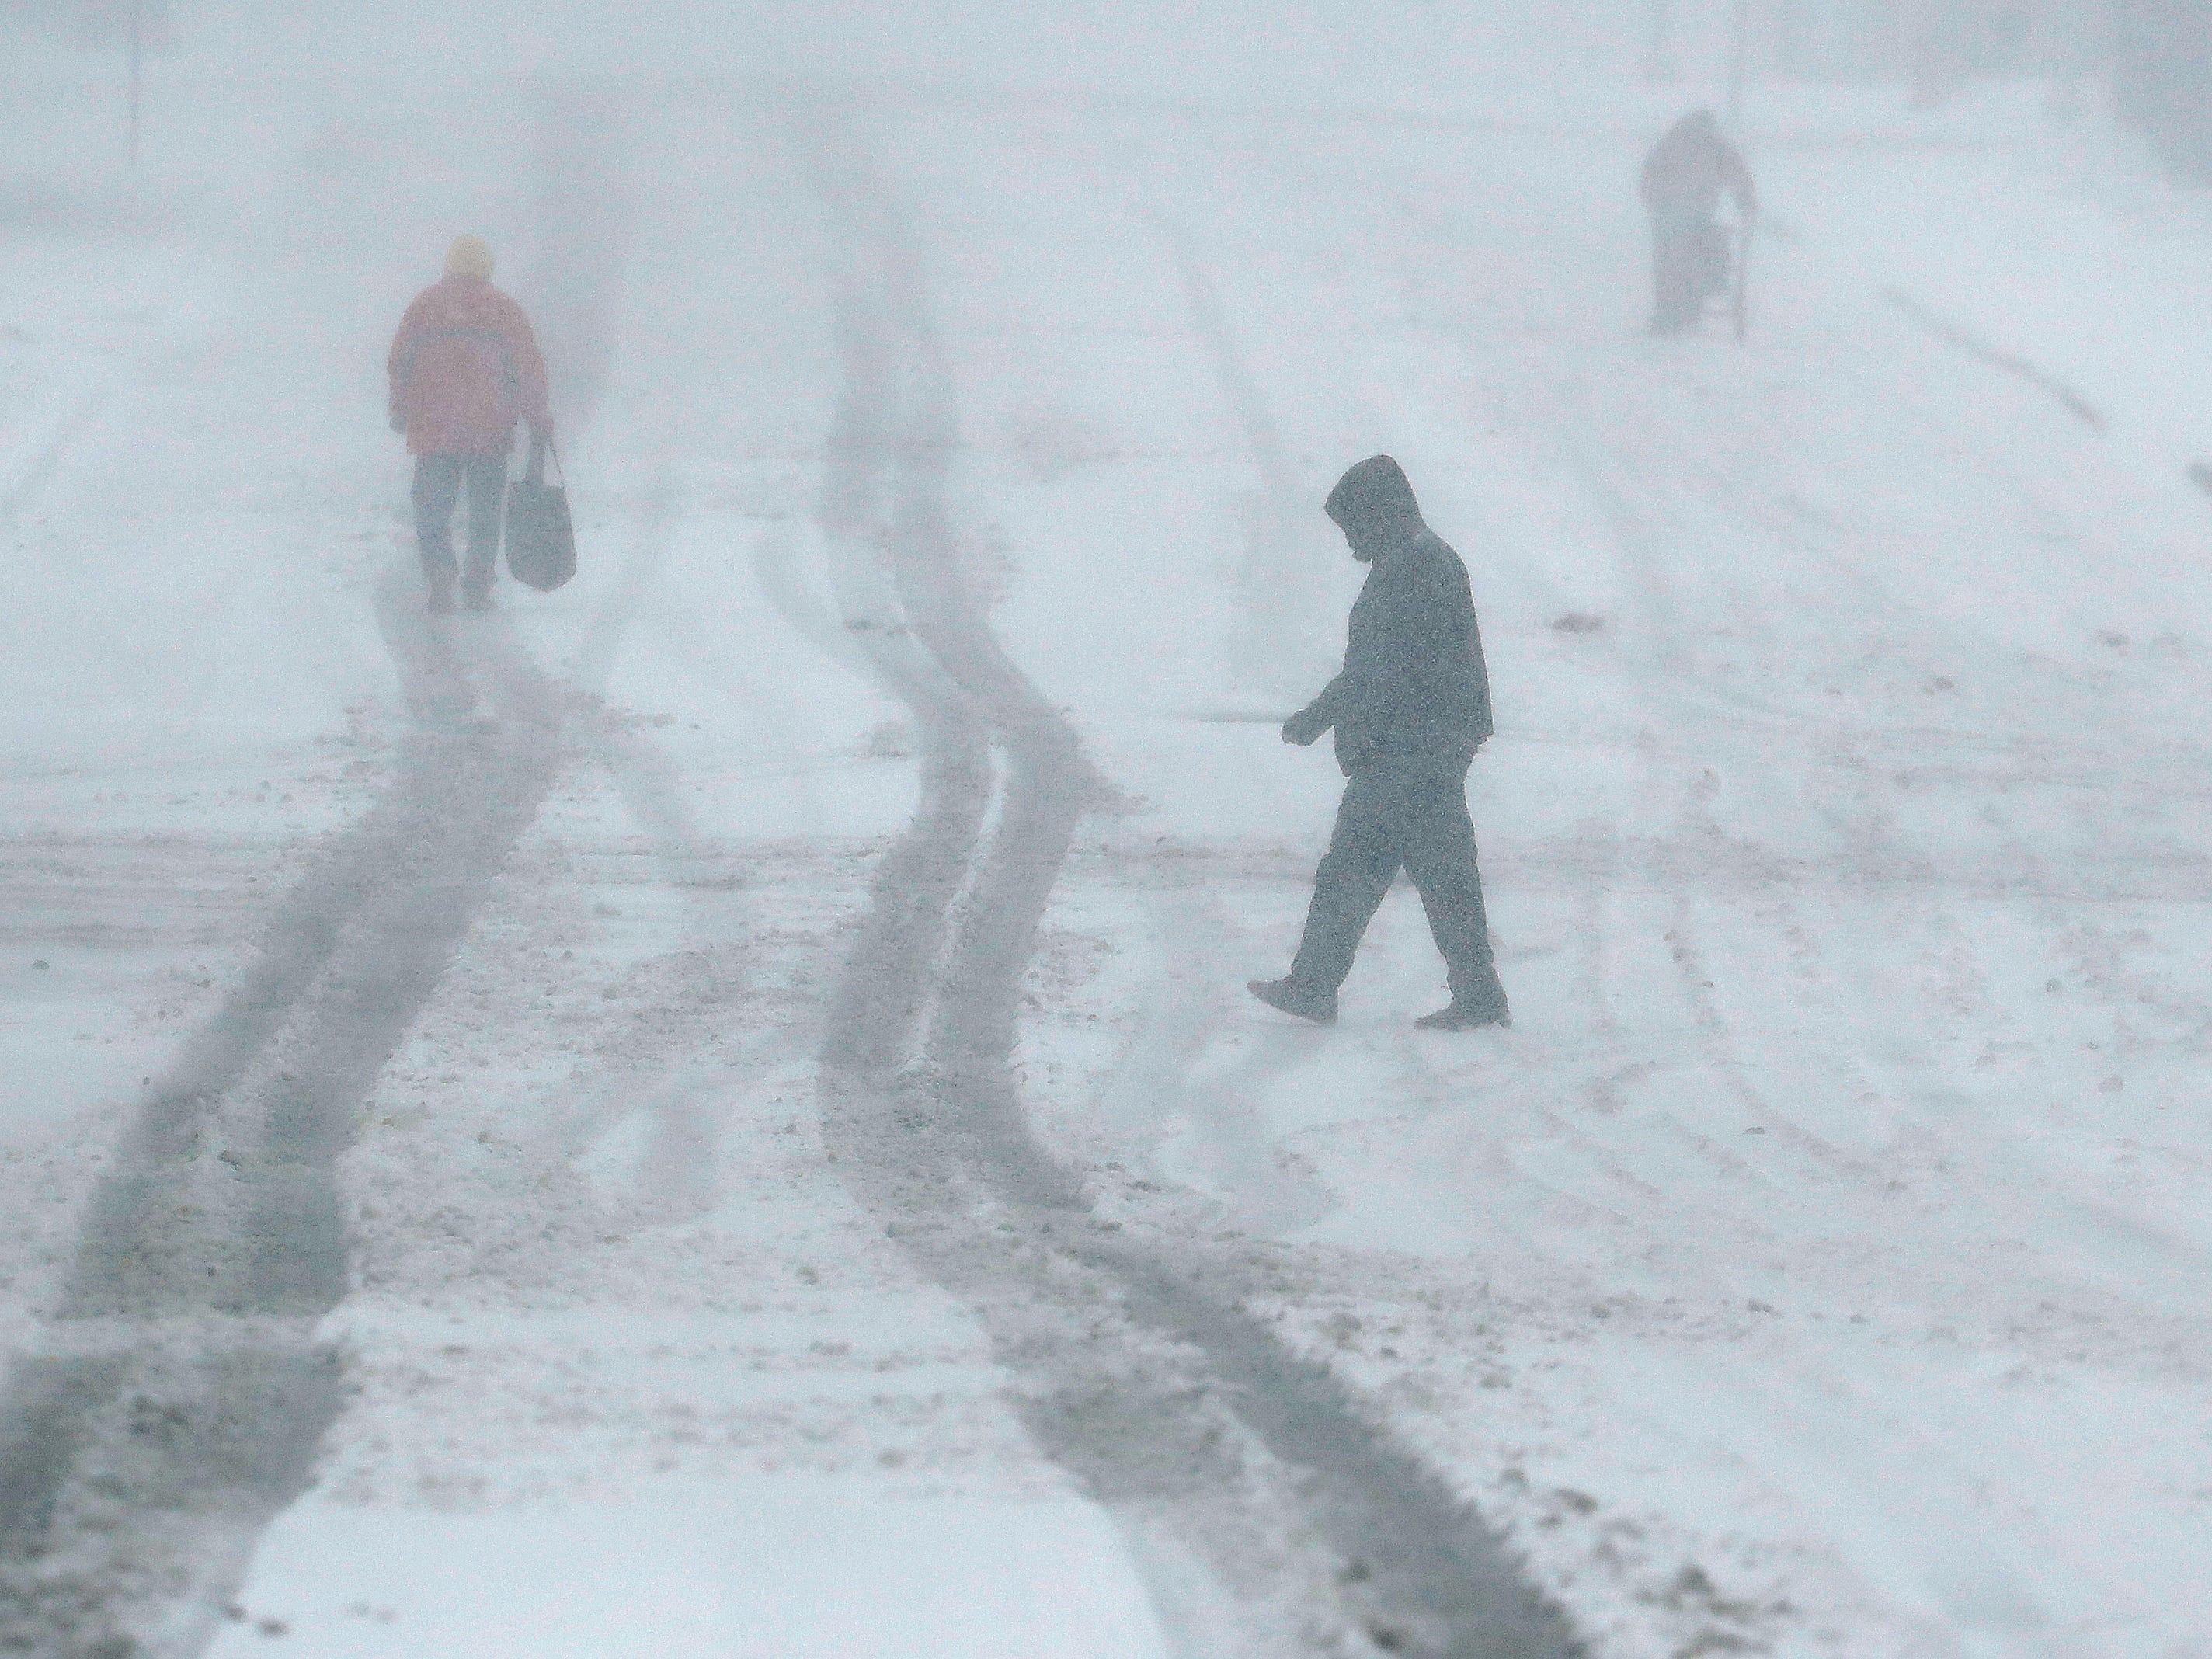 Pedestrians walk along a snow-covered street on Nov. 25, 2018, in Kansas City, Mo.